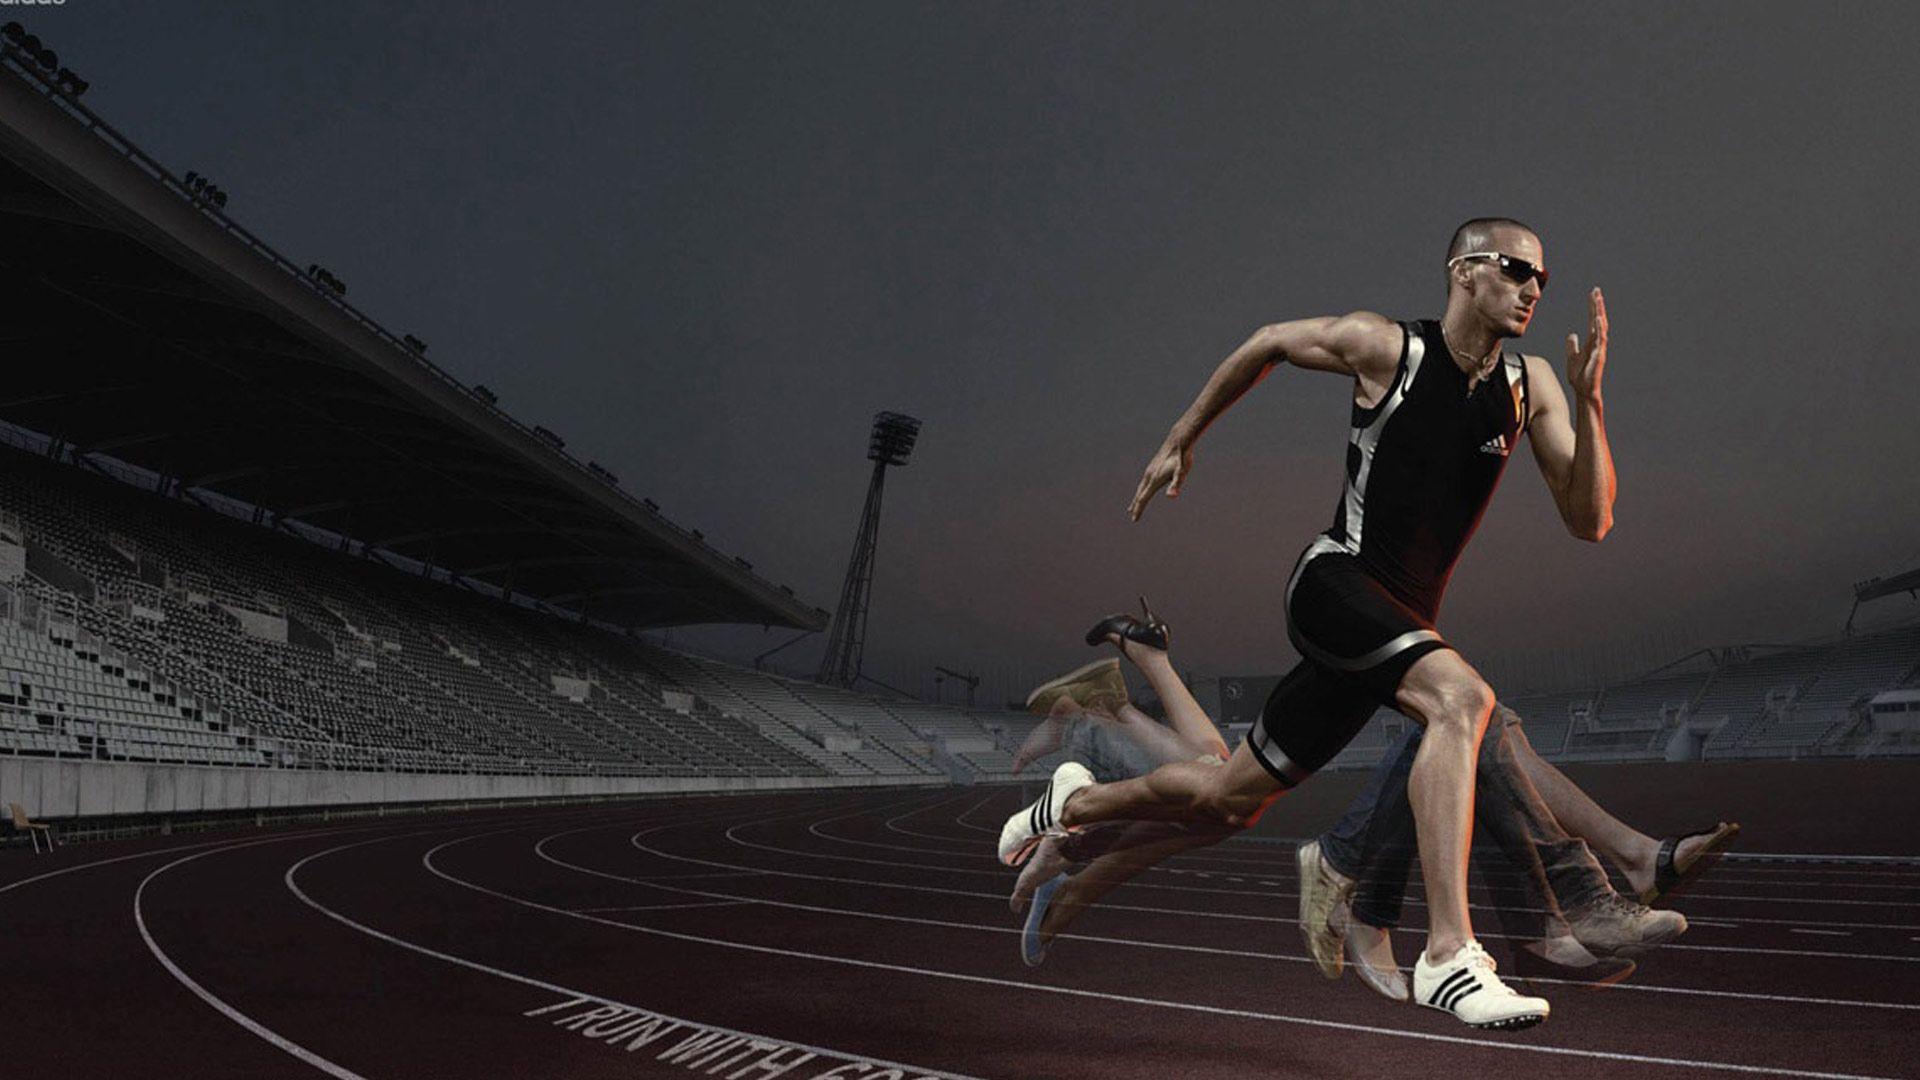 Running Sport Wallpaper Free HD Images 472187298